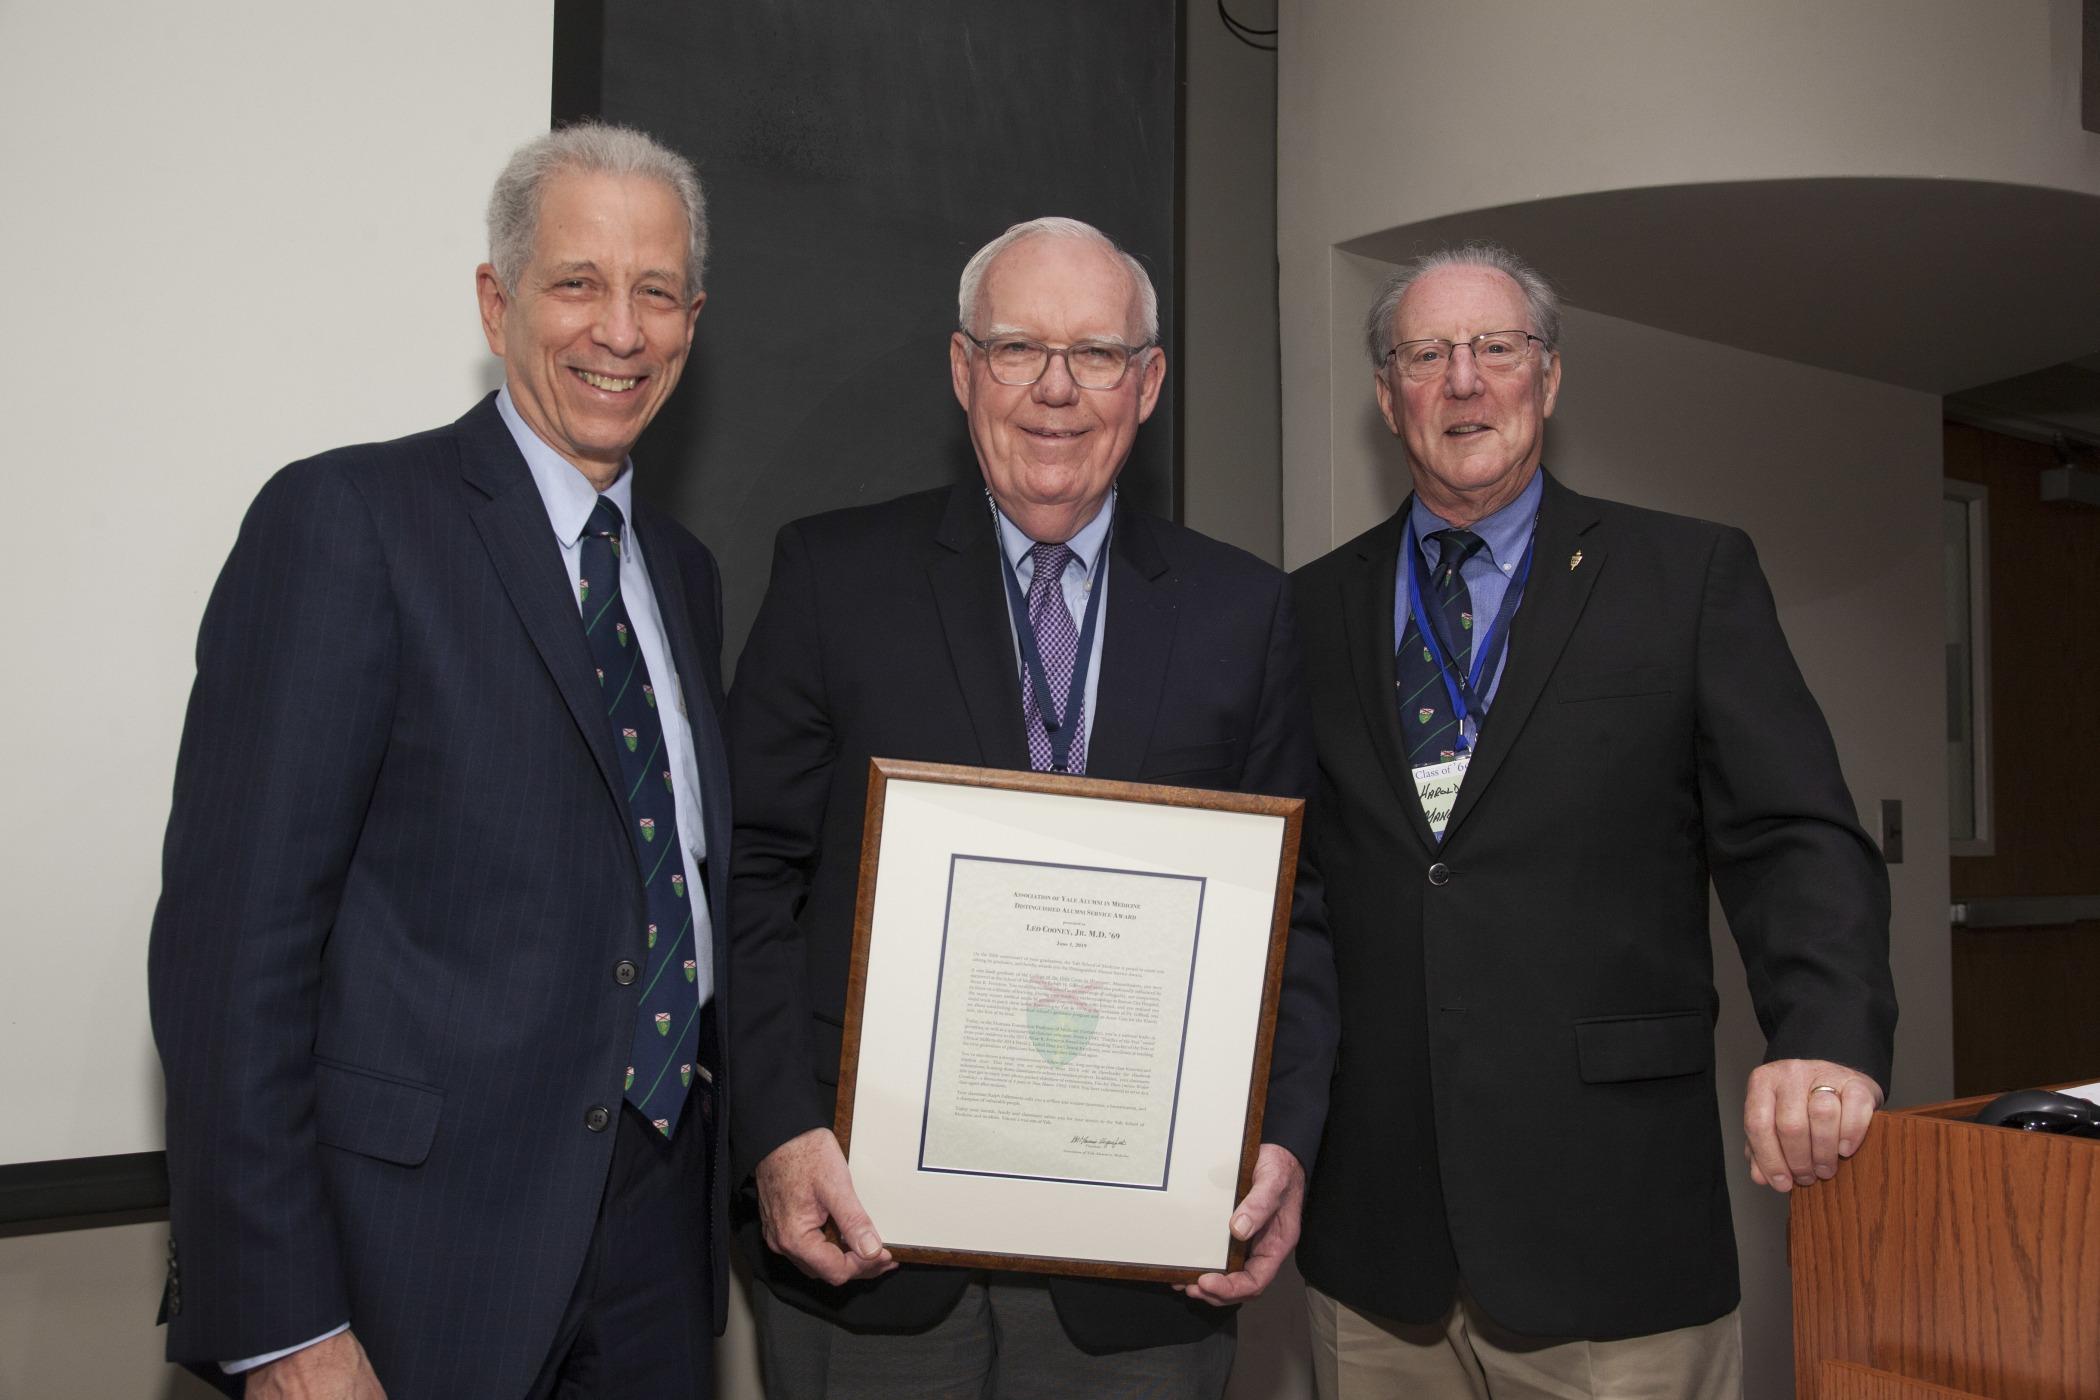 Leo Cooney, M.D. '69, received the Distinguished Alumni Service Award from Dean Robert Alpern and AYAM President Harold Mancusi-Ungaro, M.D. '73